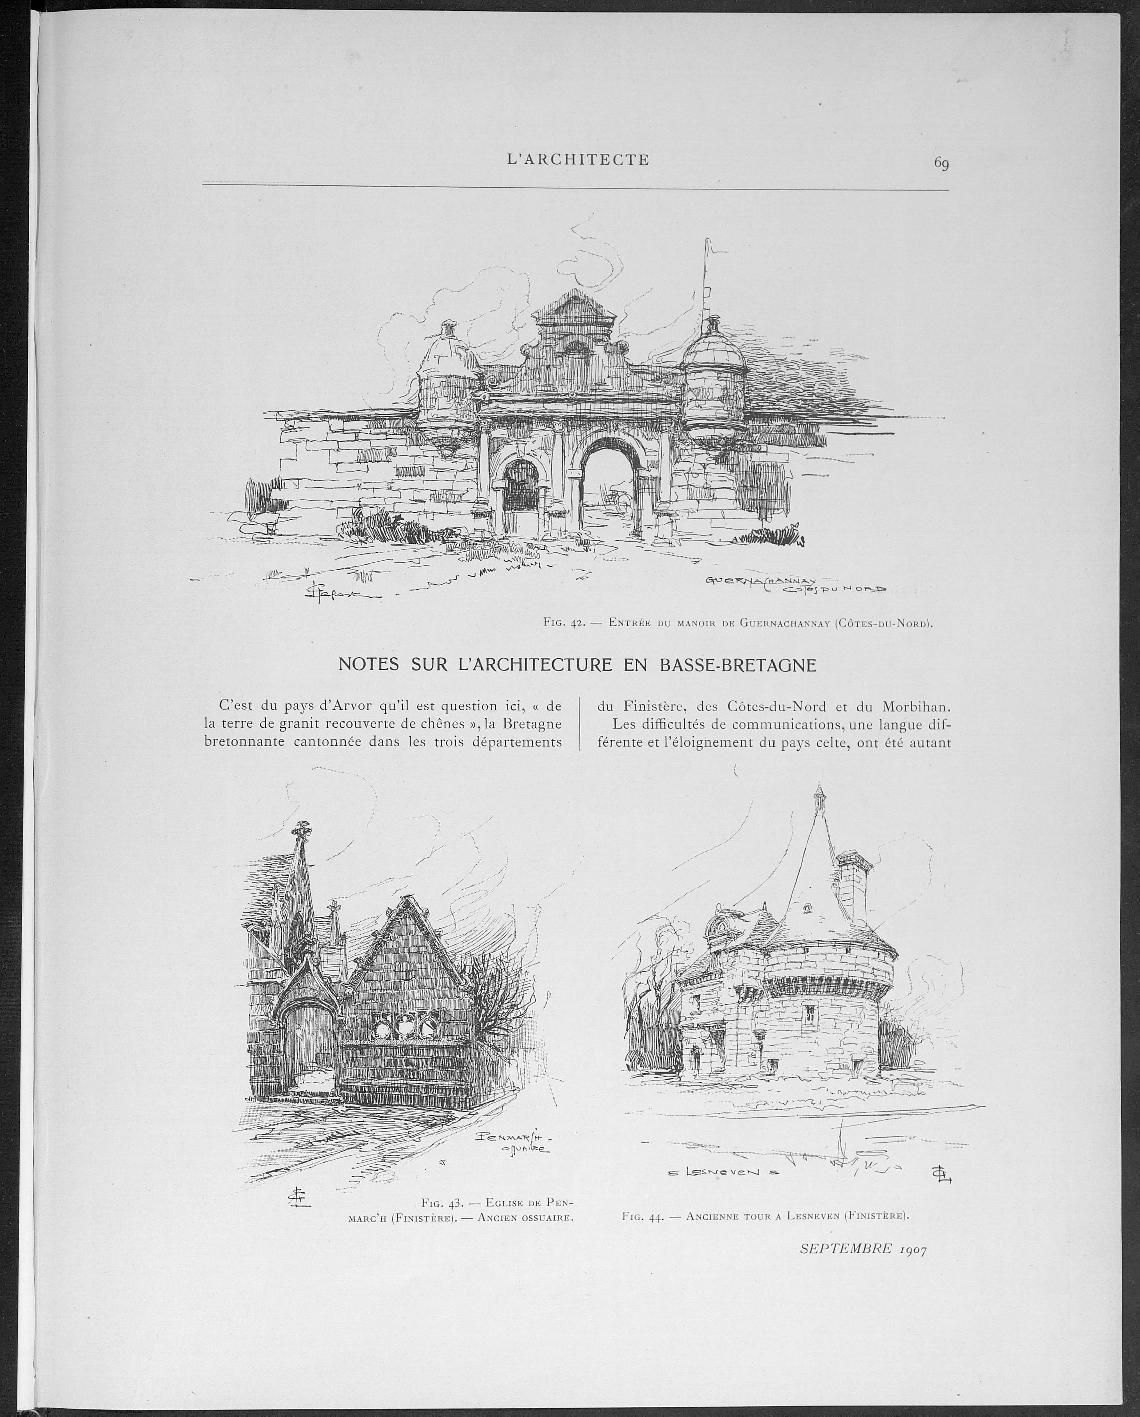 L'Architecte, no. 9, 1907 |